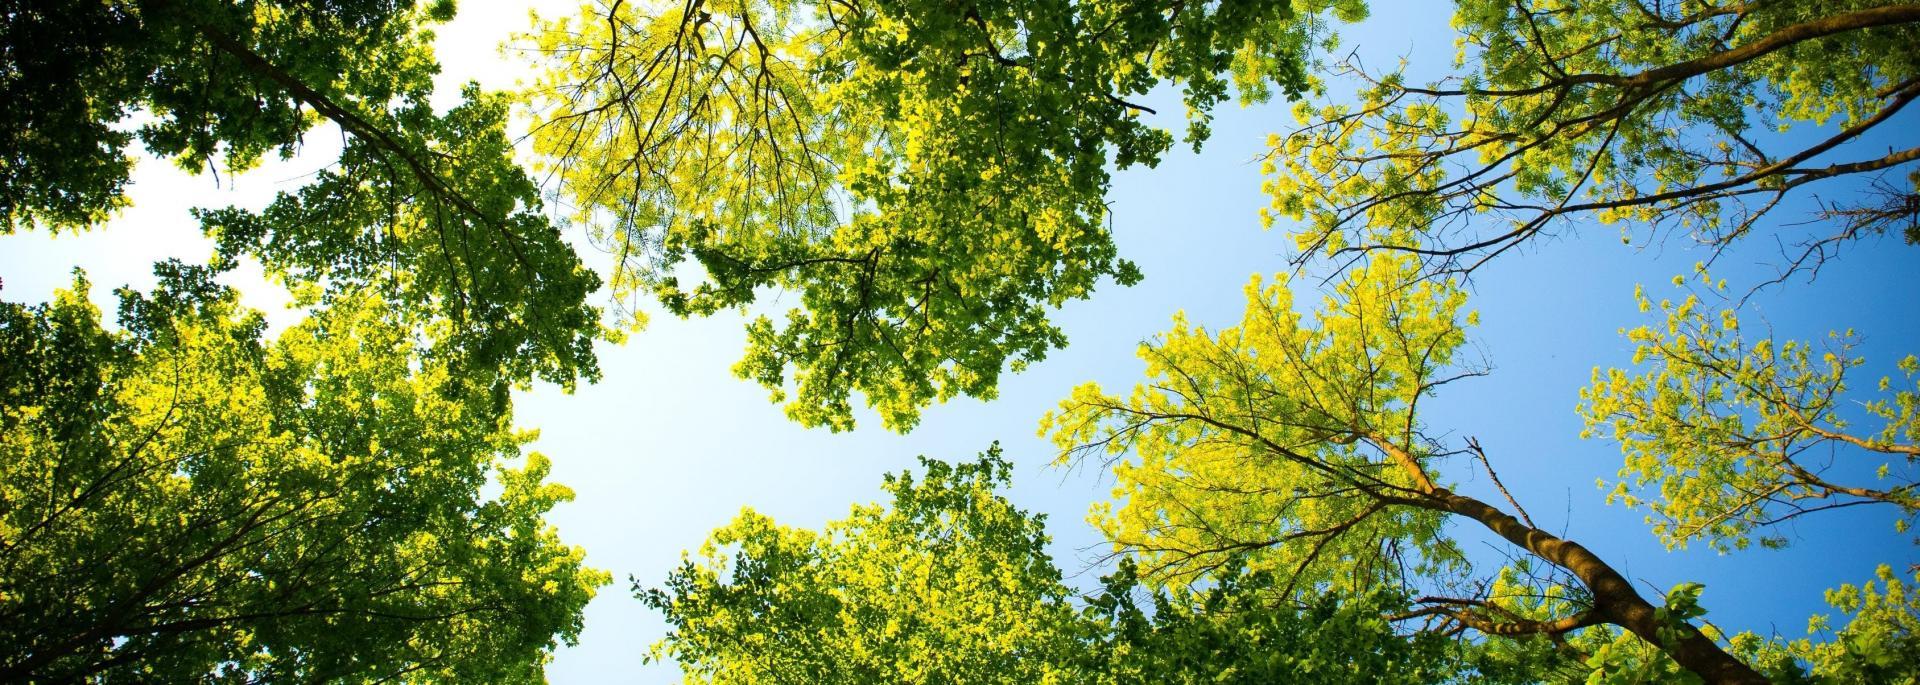 Spruce Grove 2